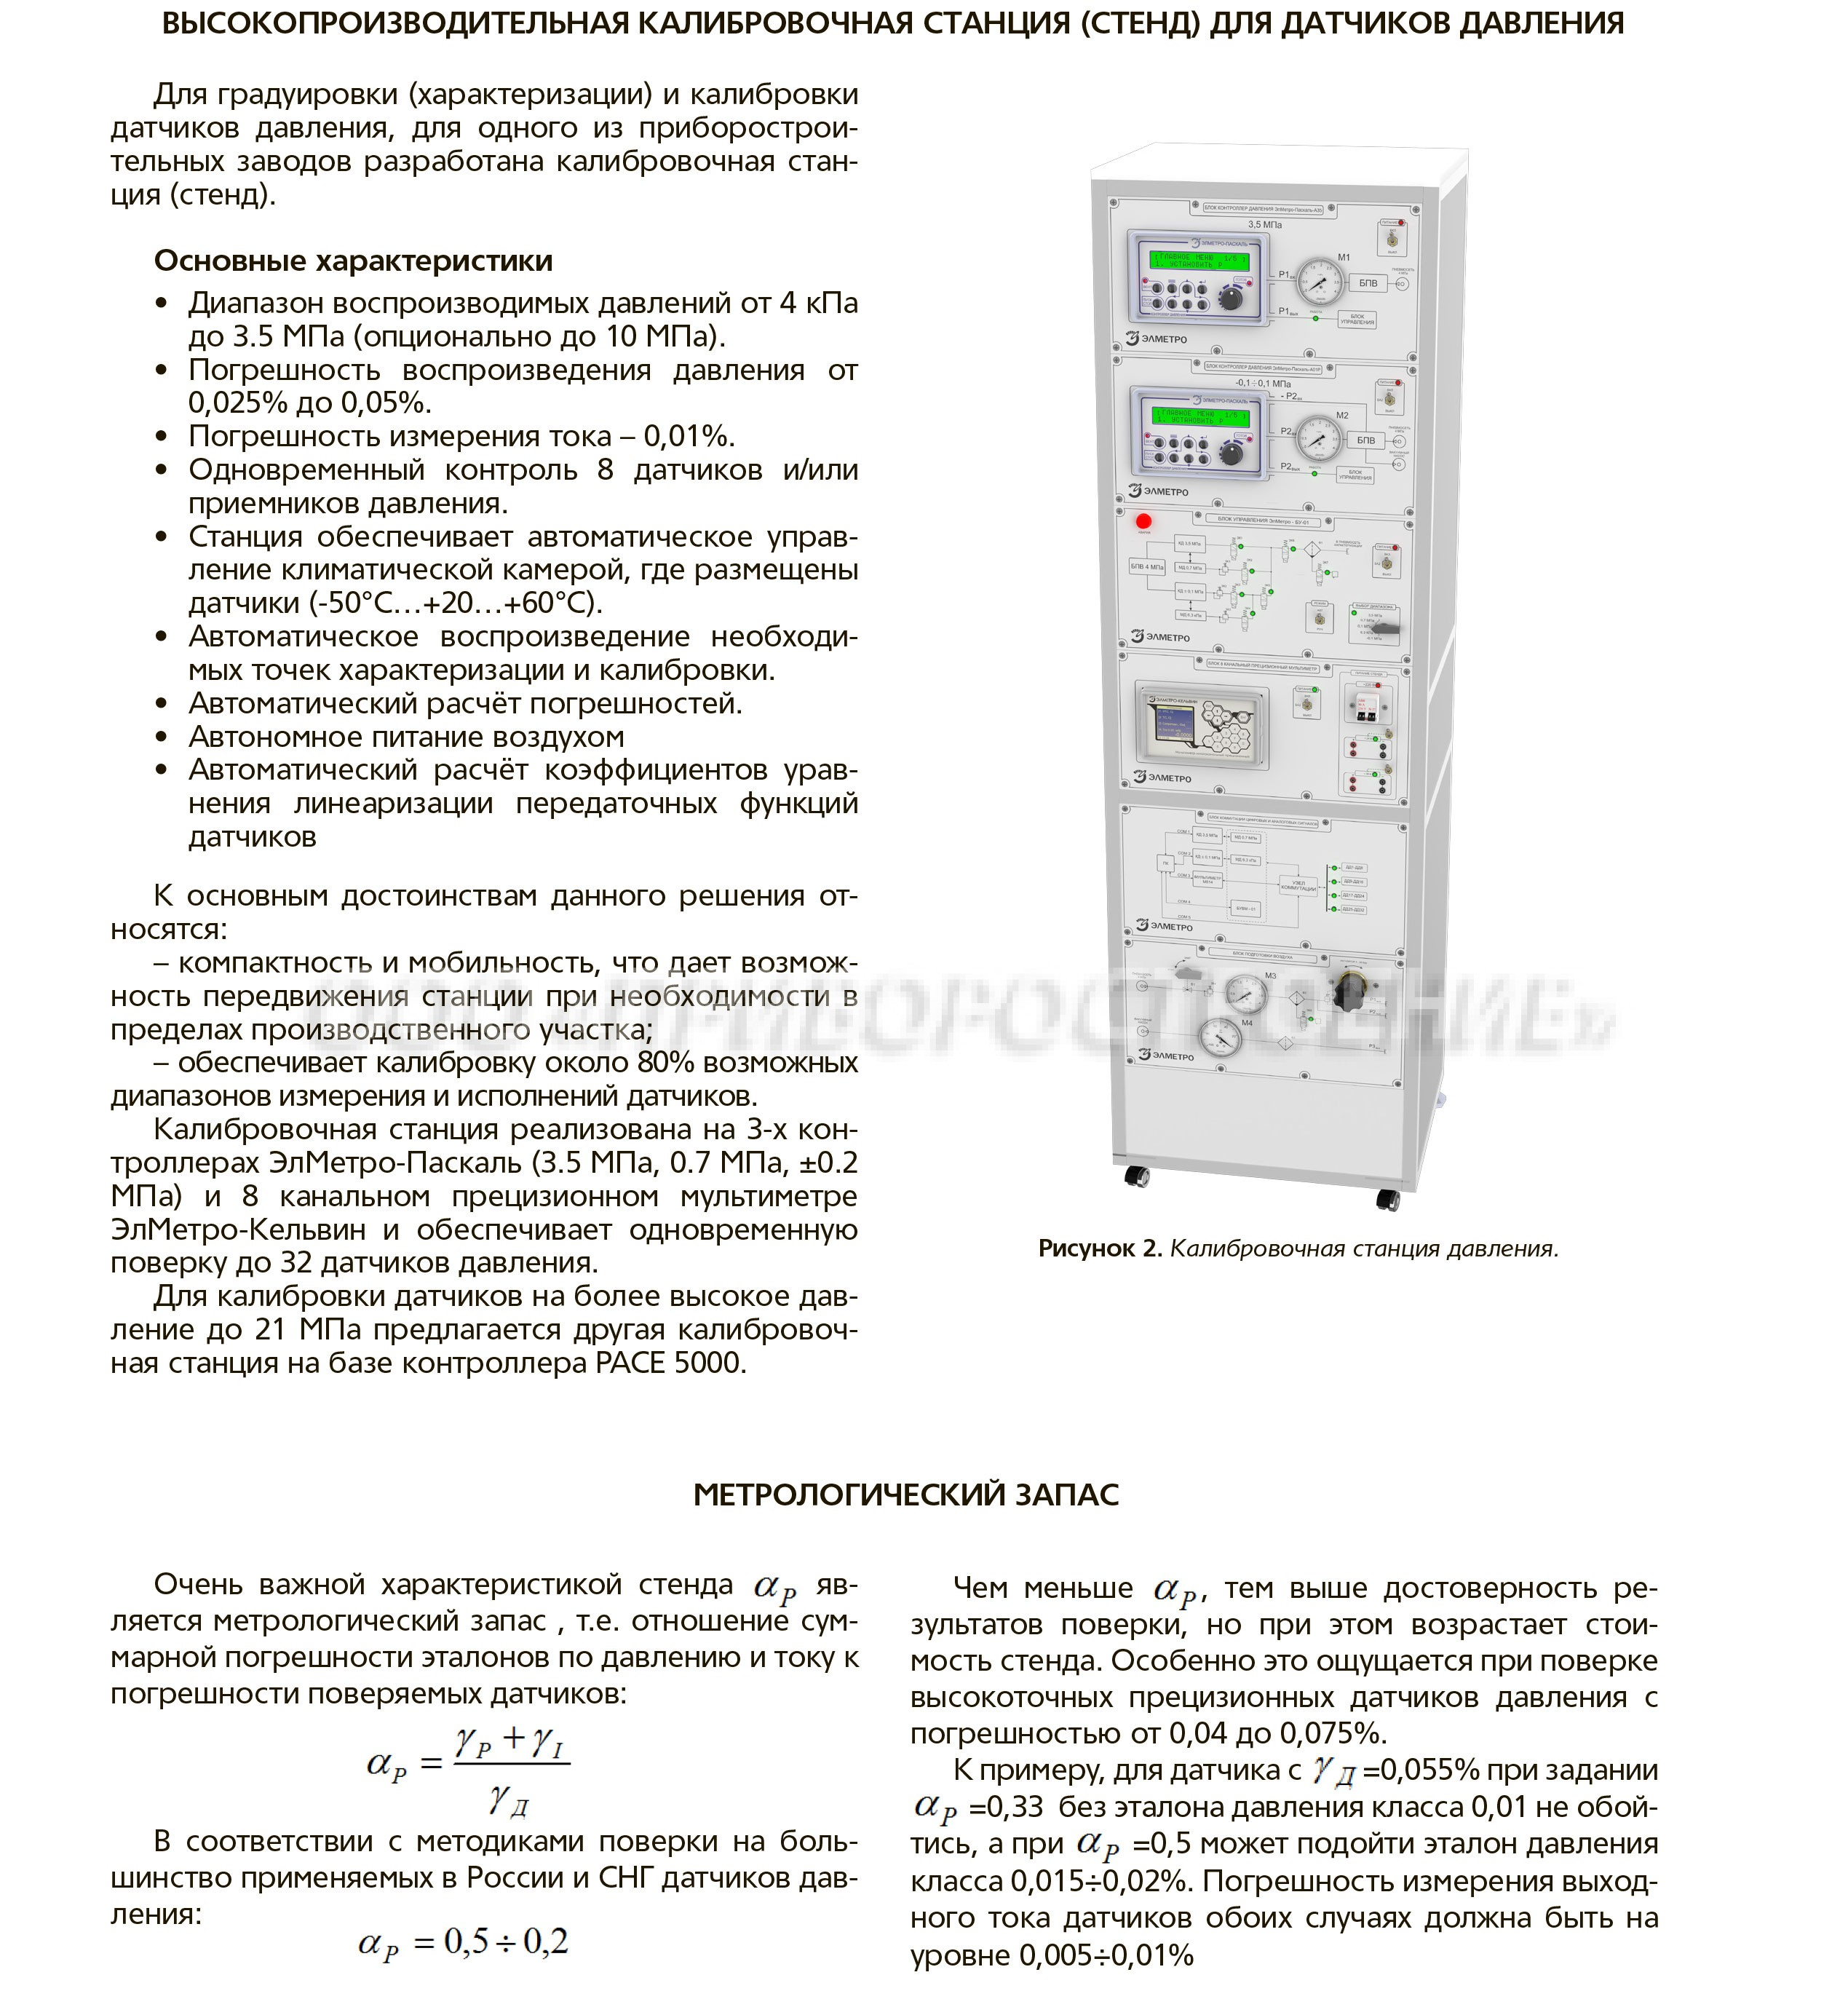 metr-stendi-4